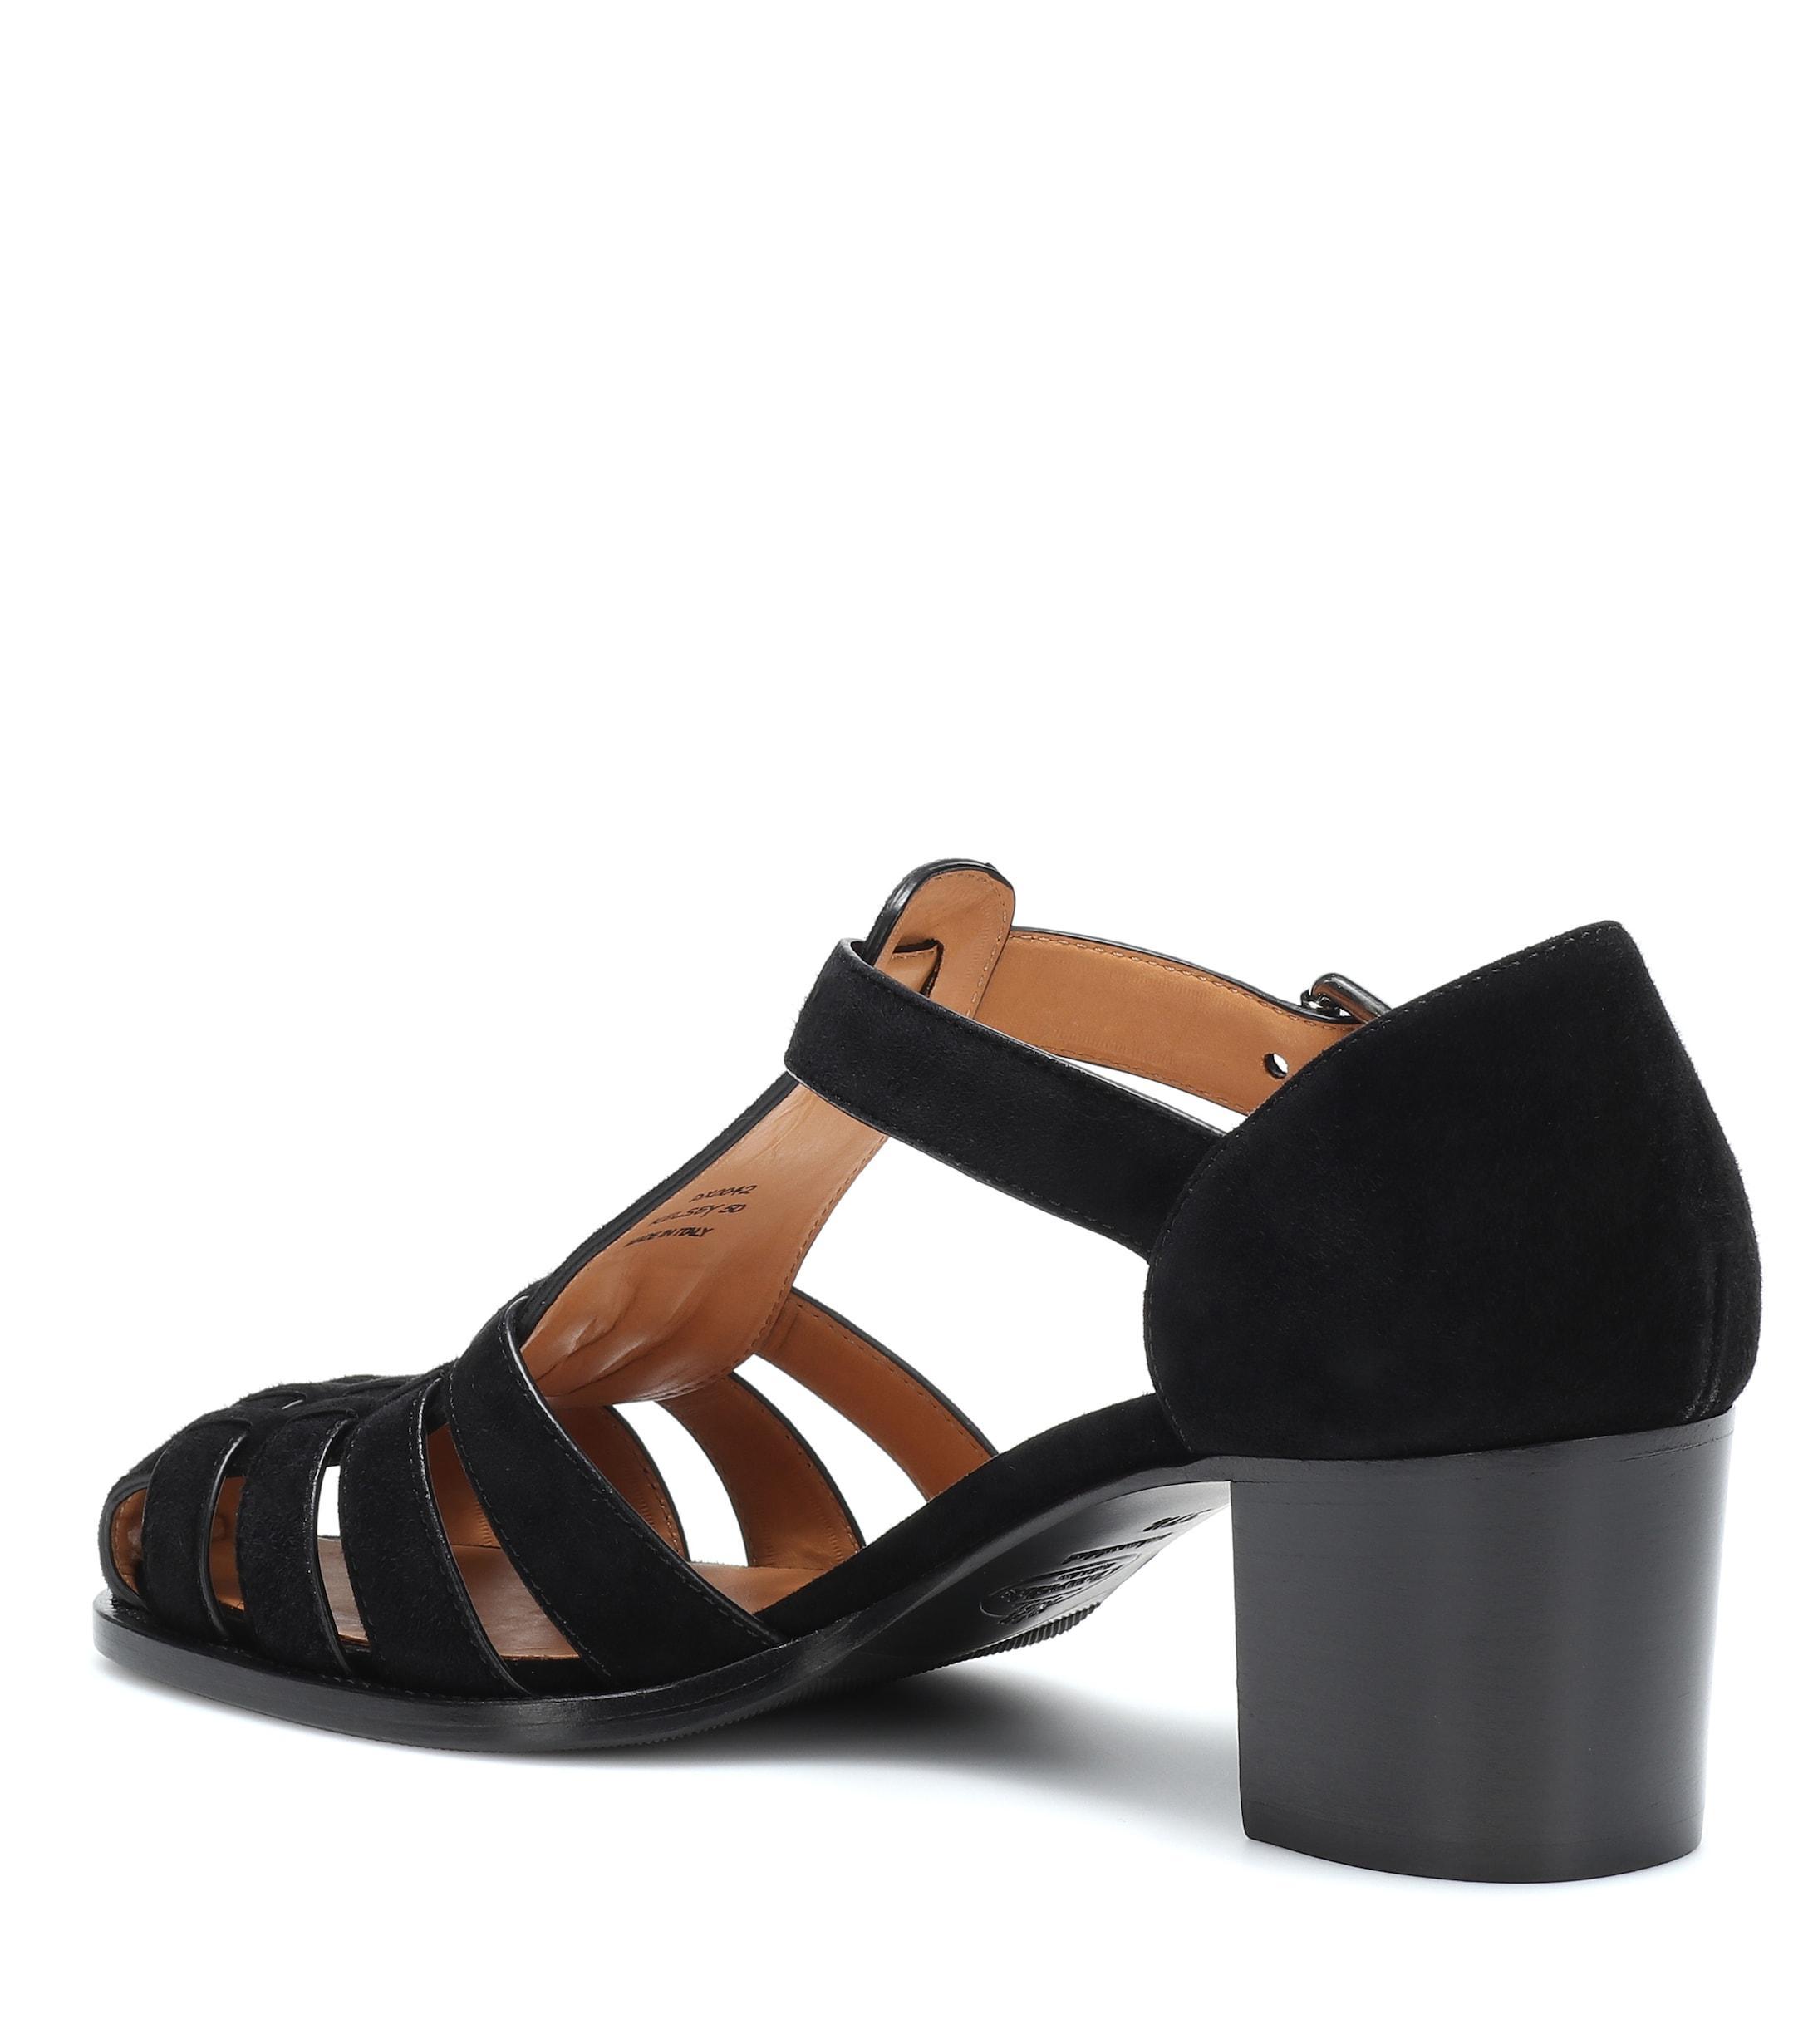 4a357fda94fe Church s - Black Kelsey Suede Sandals - Lyst. View fullscreen